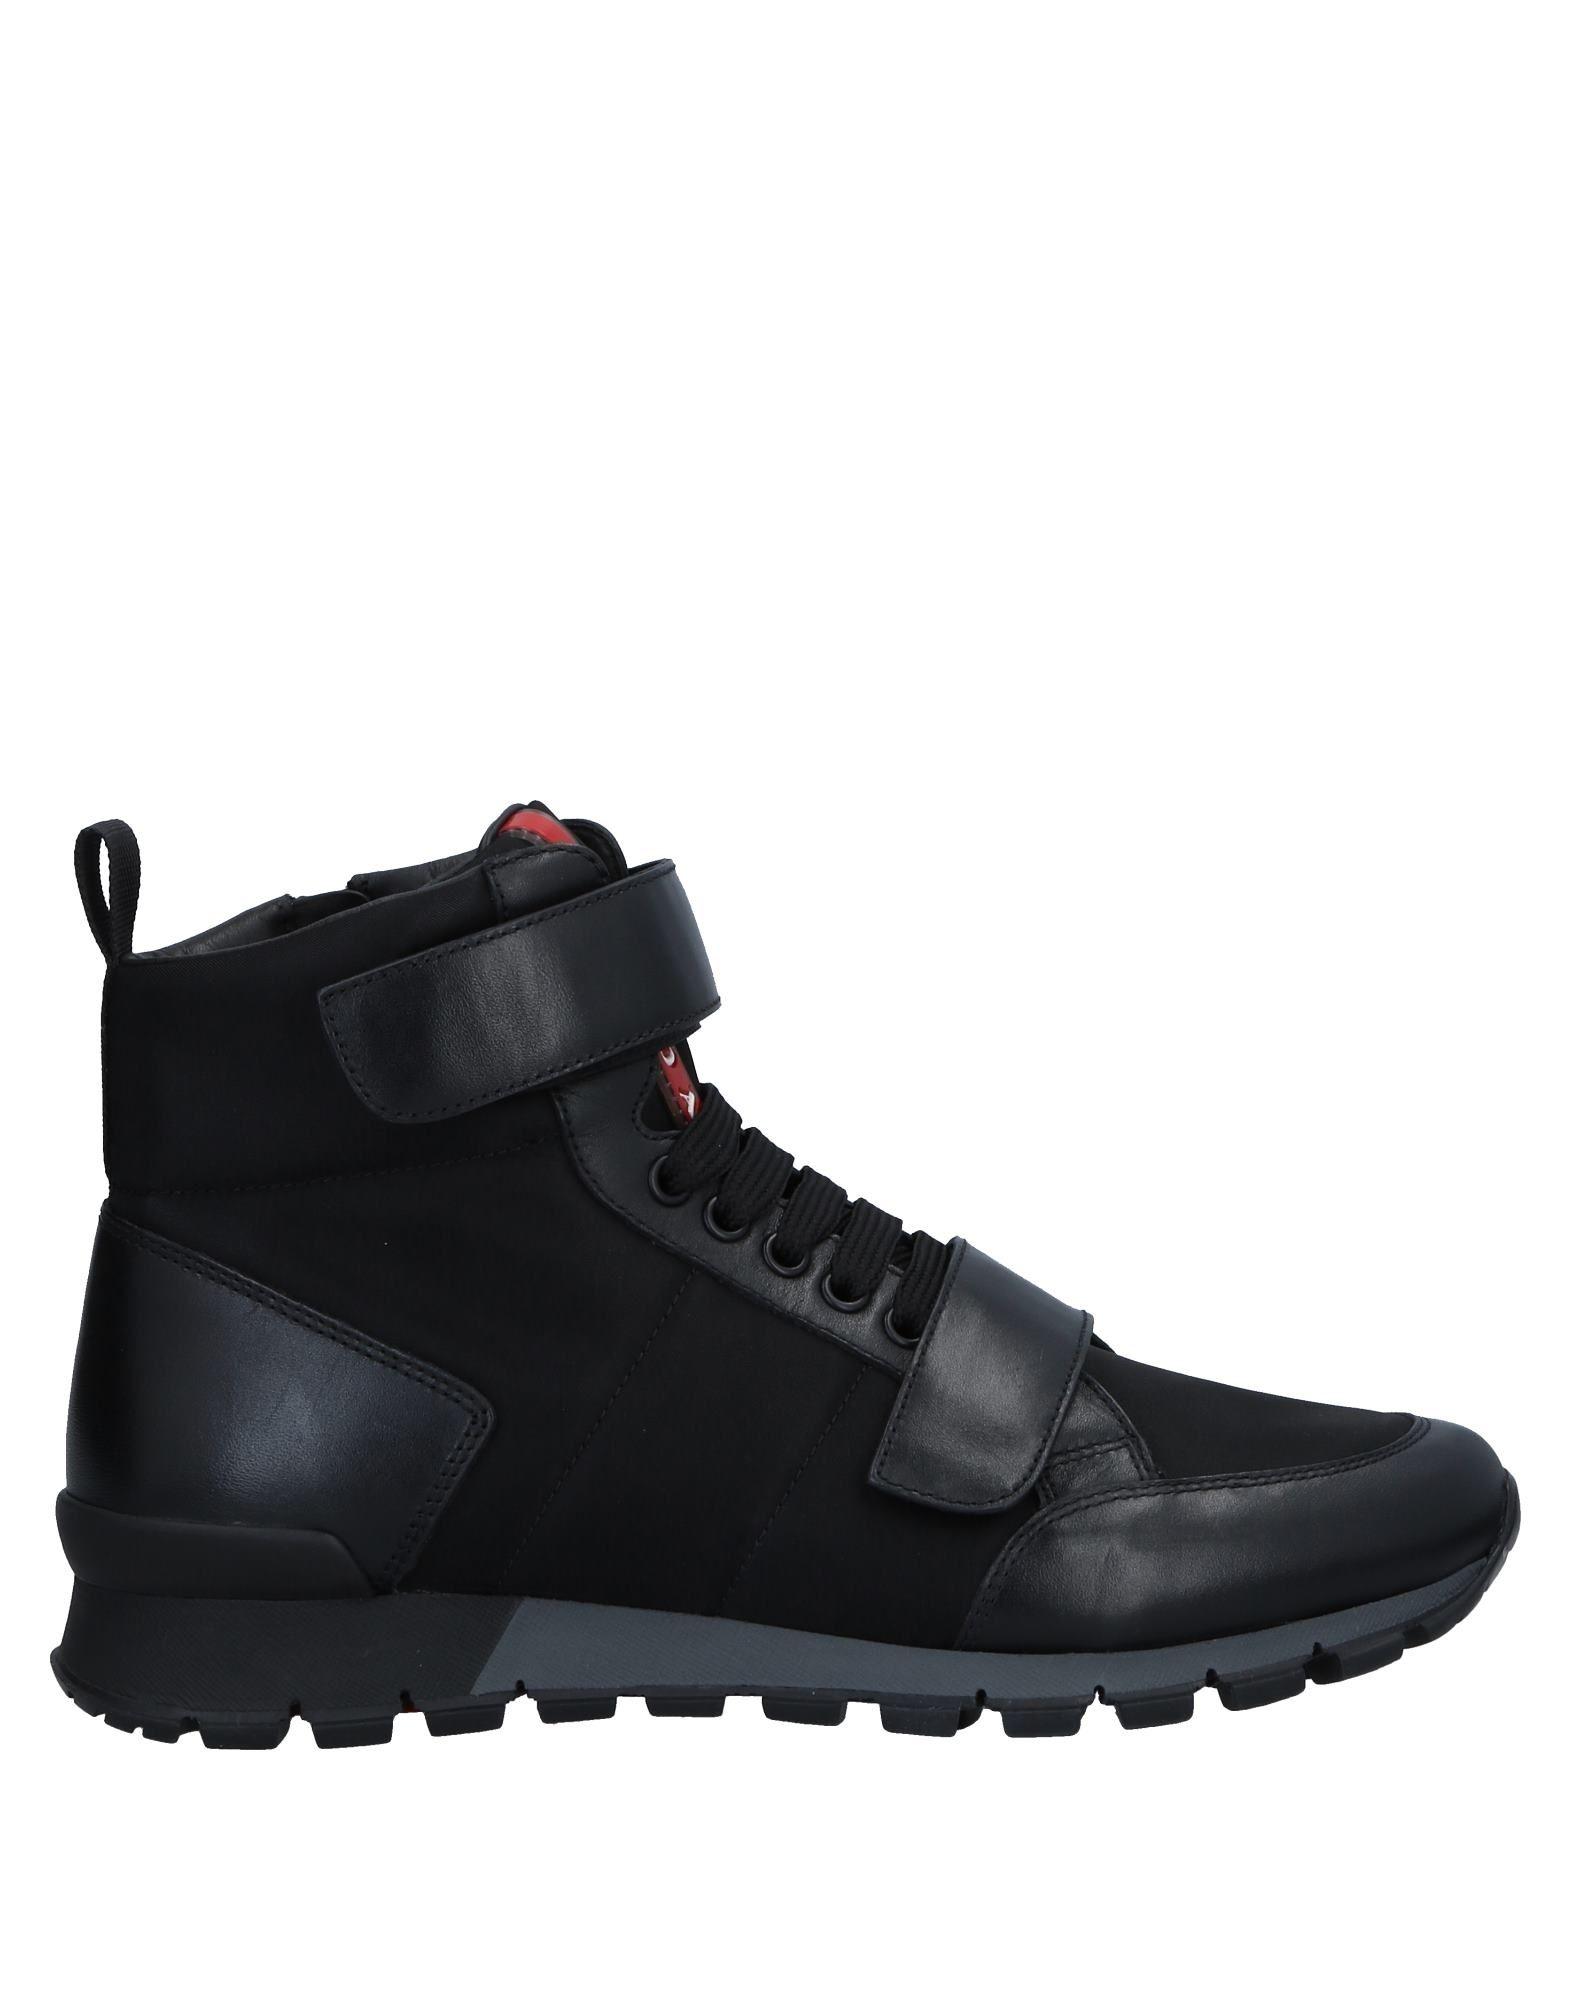 Prada Sport Sneakers Herren  11498564WX Gute Gute Gute Qualität beliebte Schuhe 112387